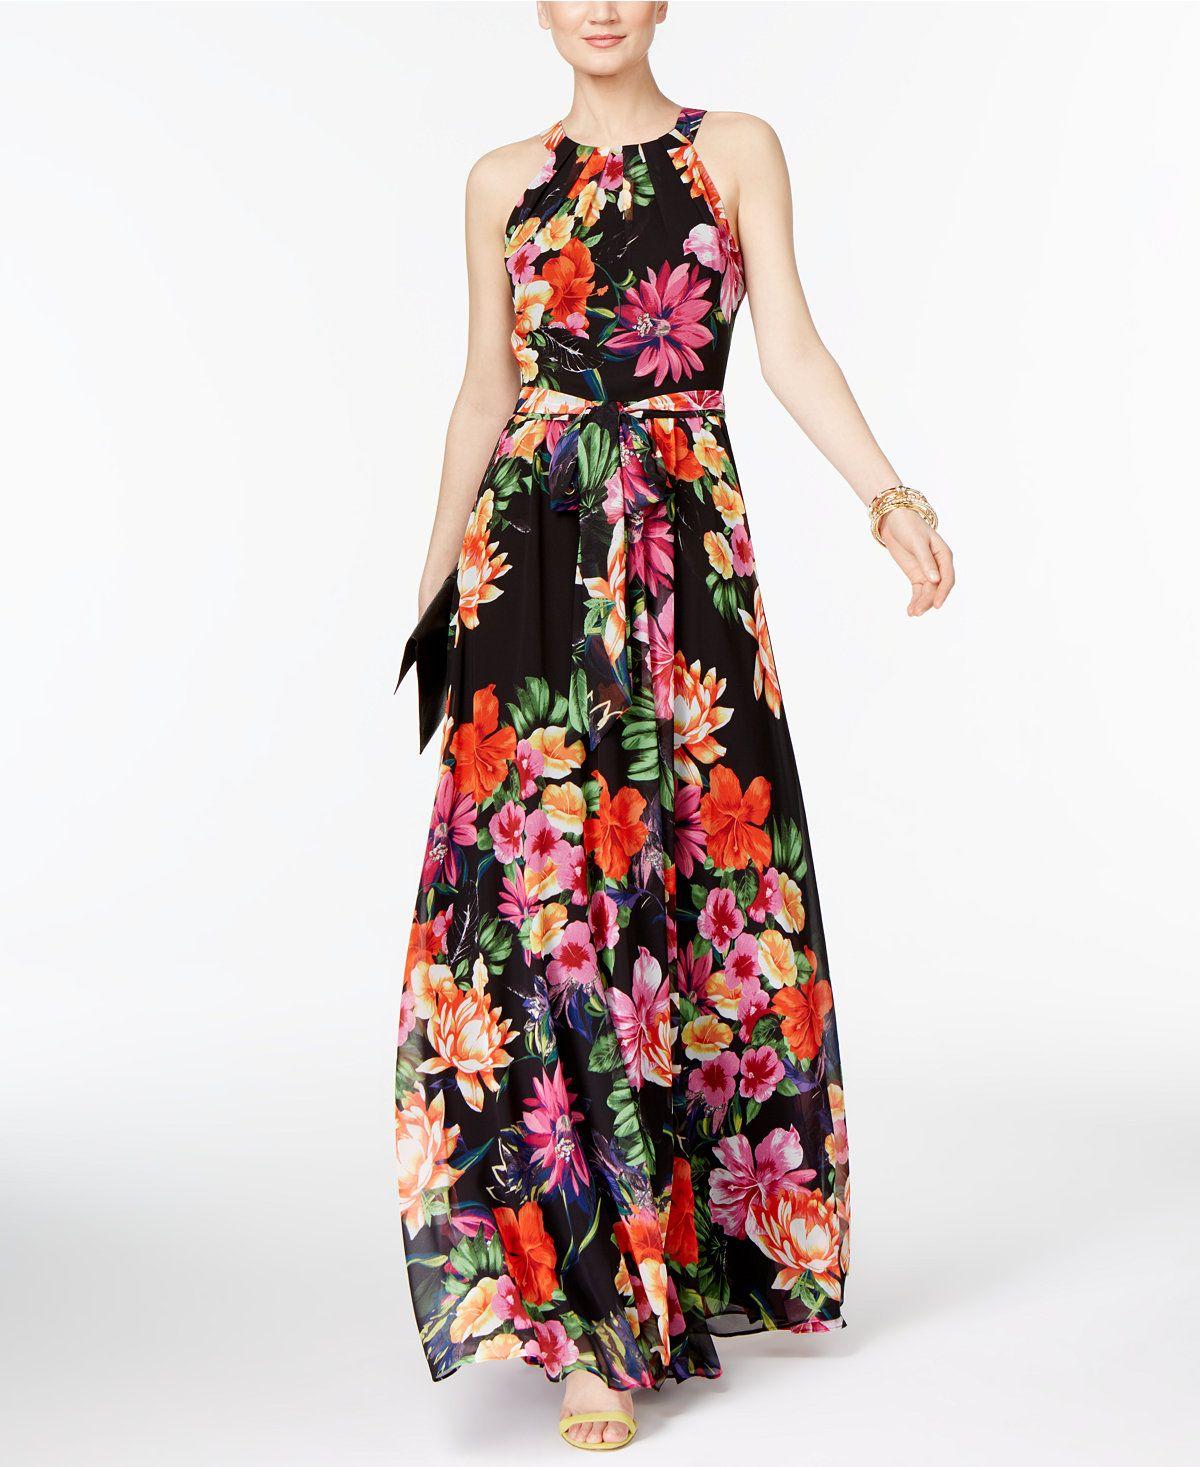 Inc International Concepts Floral Print Maxi Dress Only At Macy S Dresses Women Macy S Maxi Dress Floral Print Maxi Dress Macy Dresses